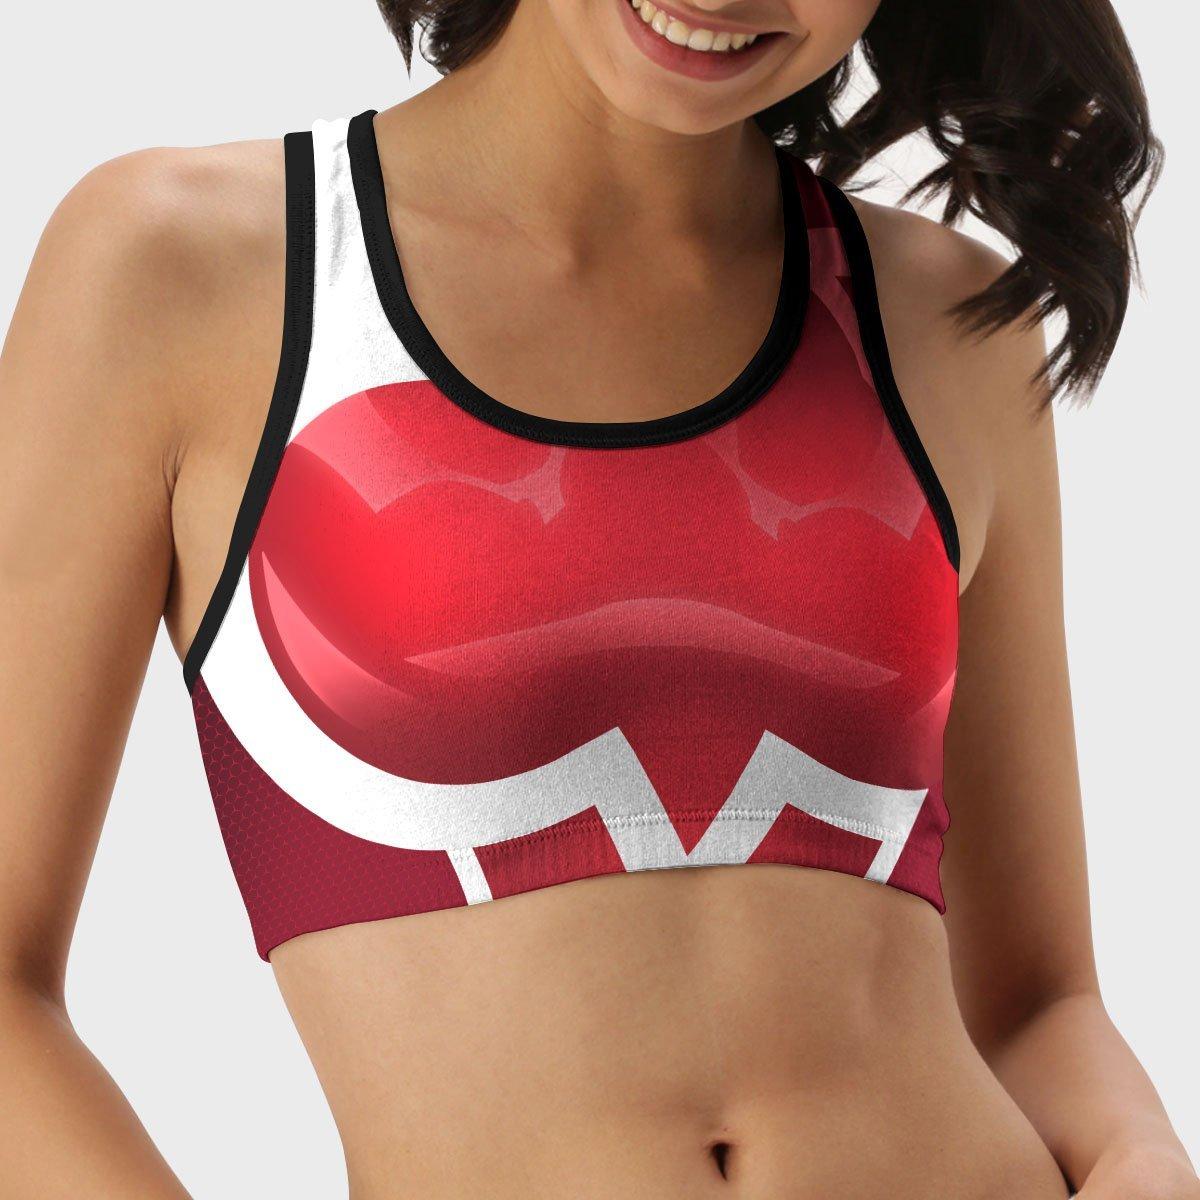 zero two armor suit active wear set 479596 - Anime Swimsuits